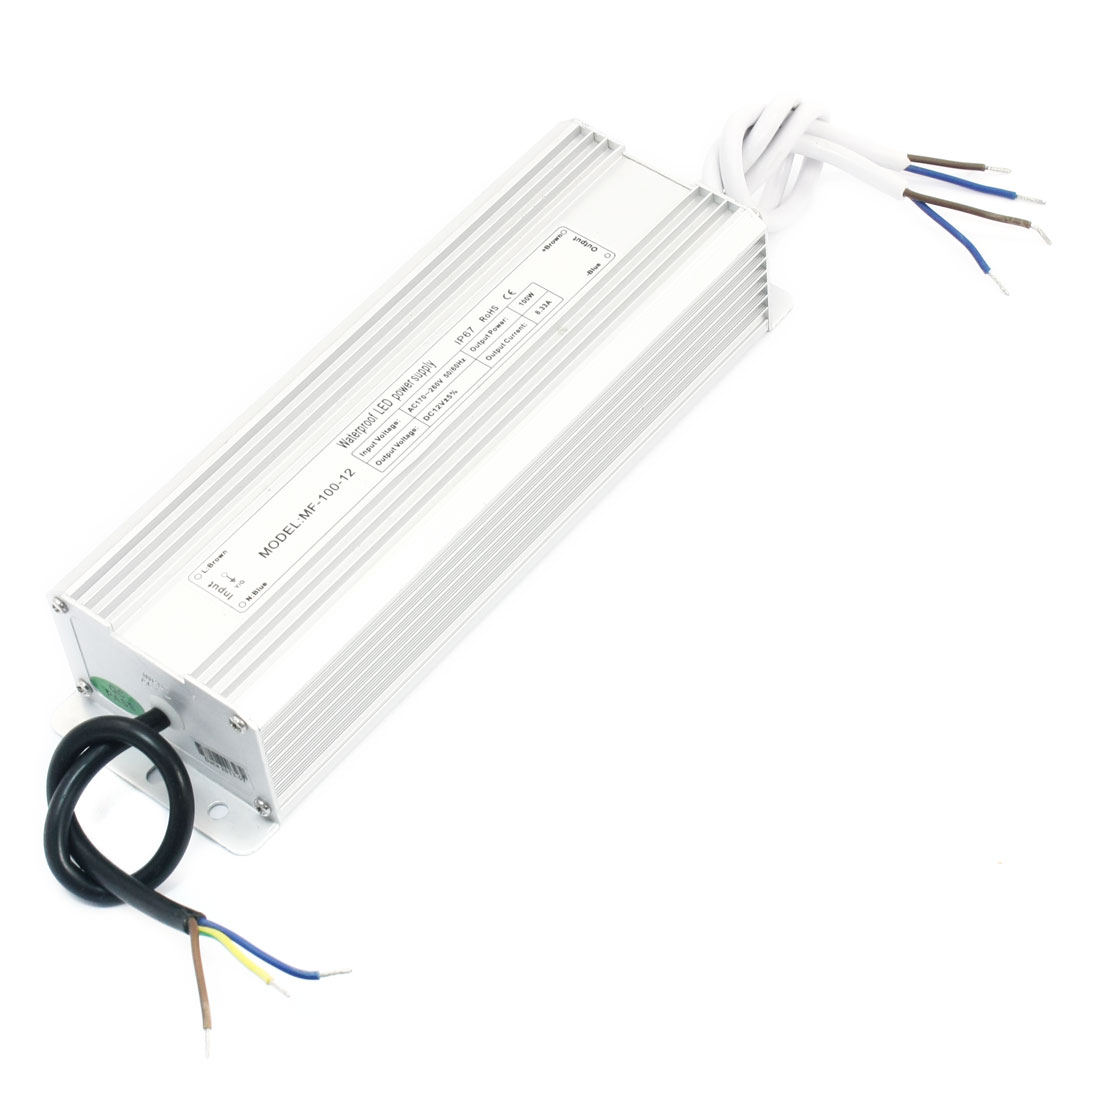 AC 170-260V Waterproof Power Supply Driver for DC 12V 100W LED Light